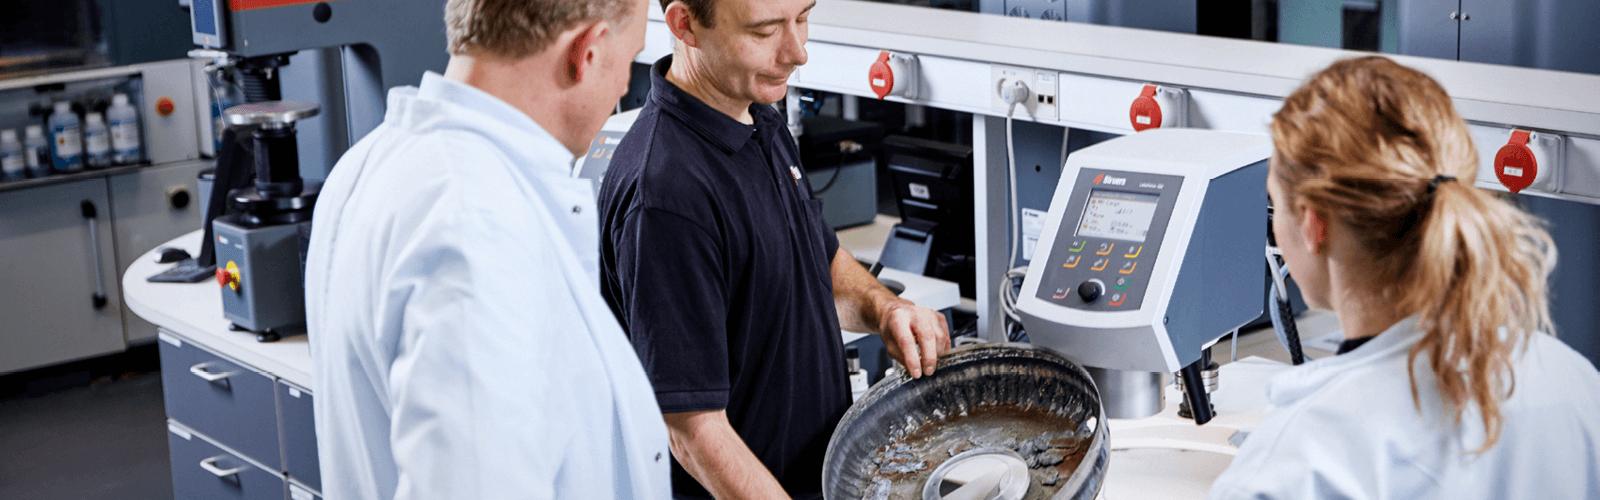 Operational Maintenance Training